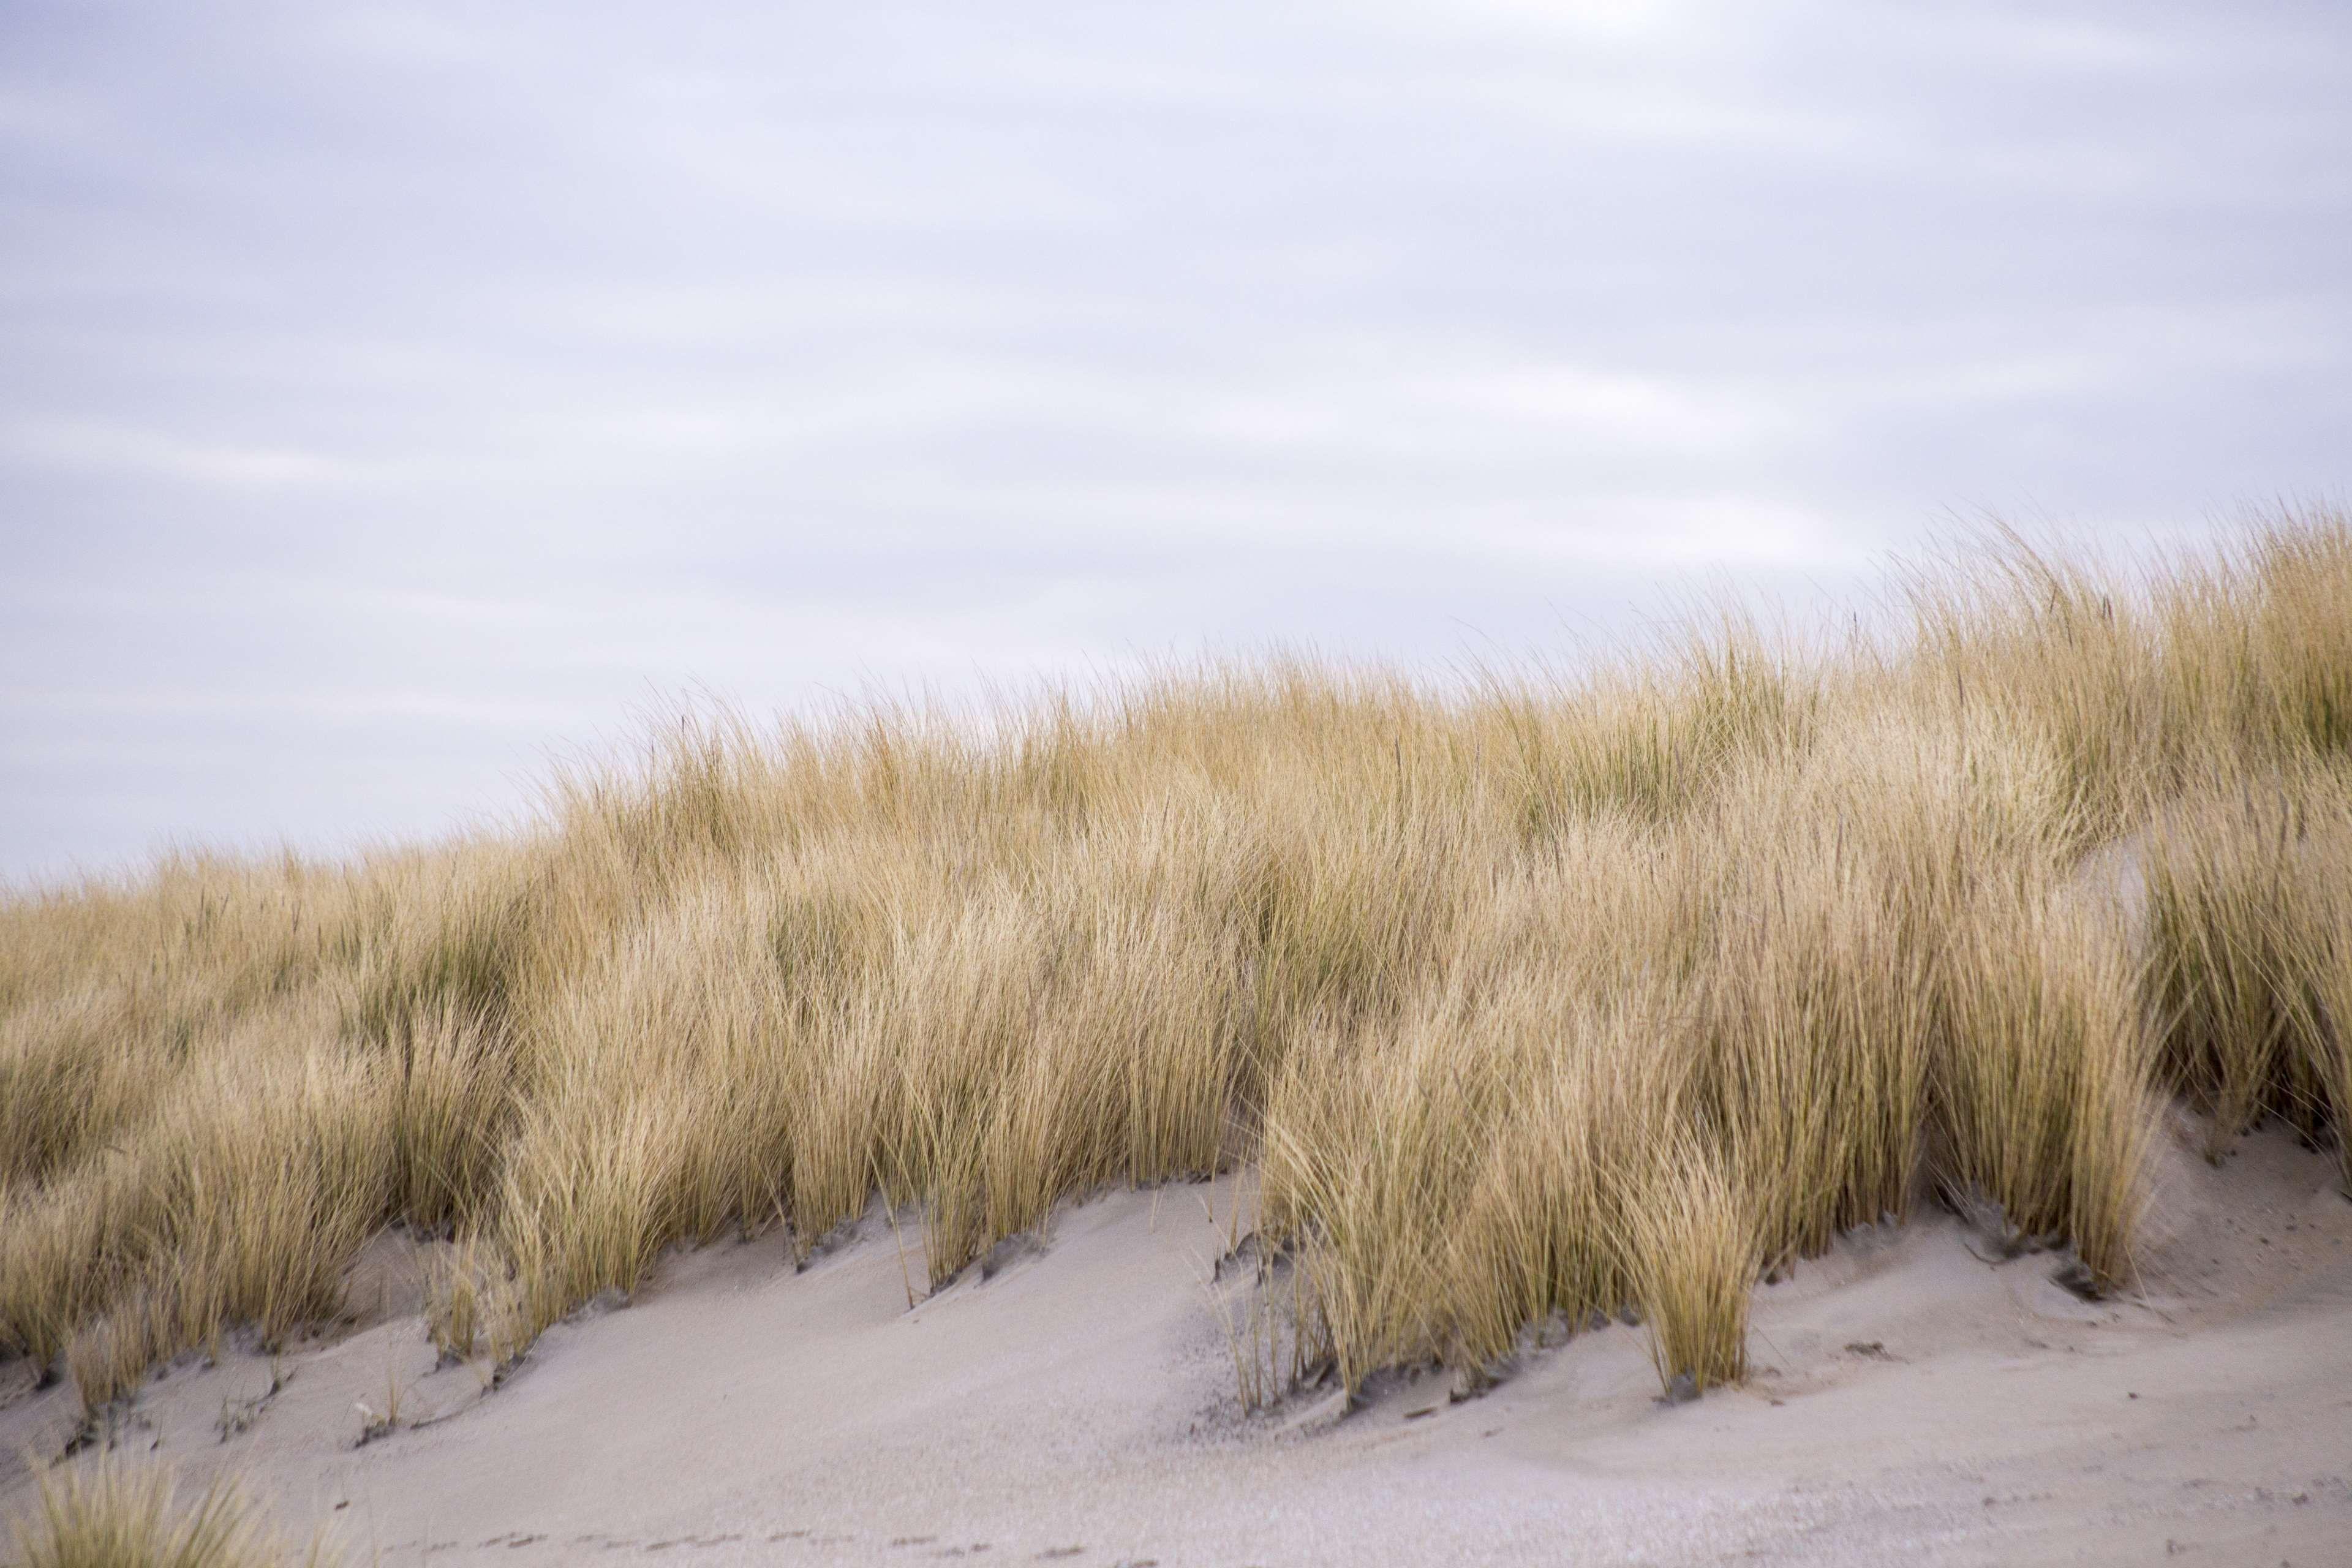 Clouds Dry Dune Dunes Environment Field Grass Landscape Marram Grass Nature Outdoors Sand Scenic Summer Travel 4k Wallpaper Landscape Fantasy Landscape Nature